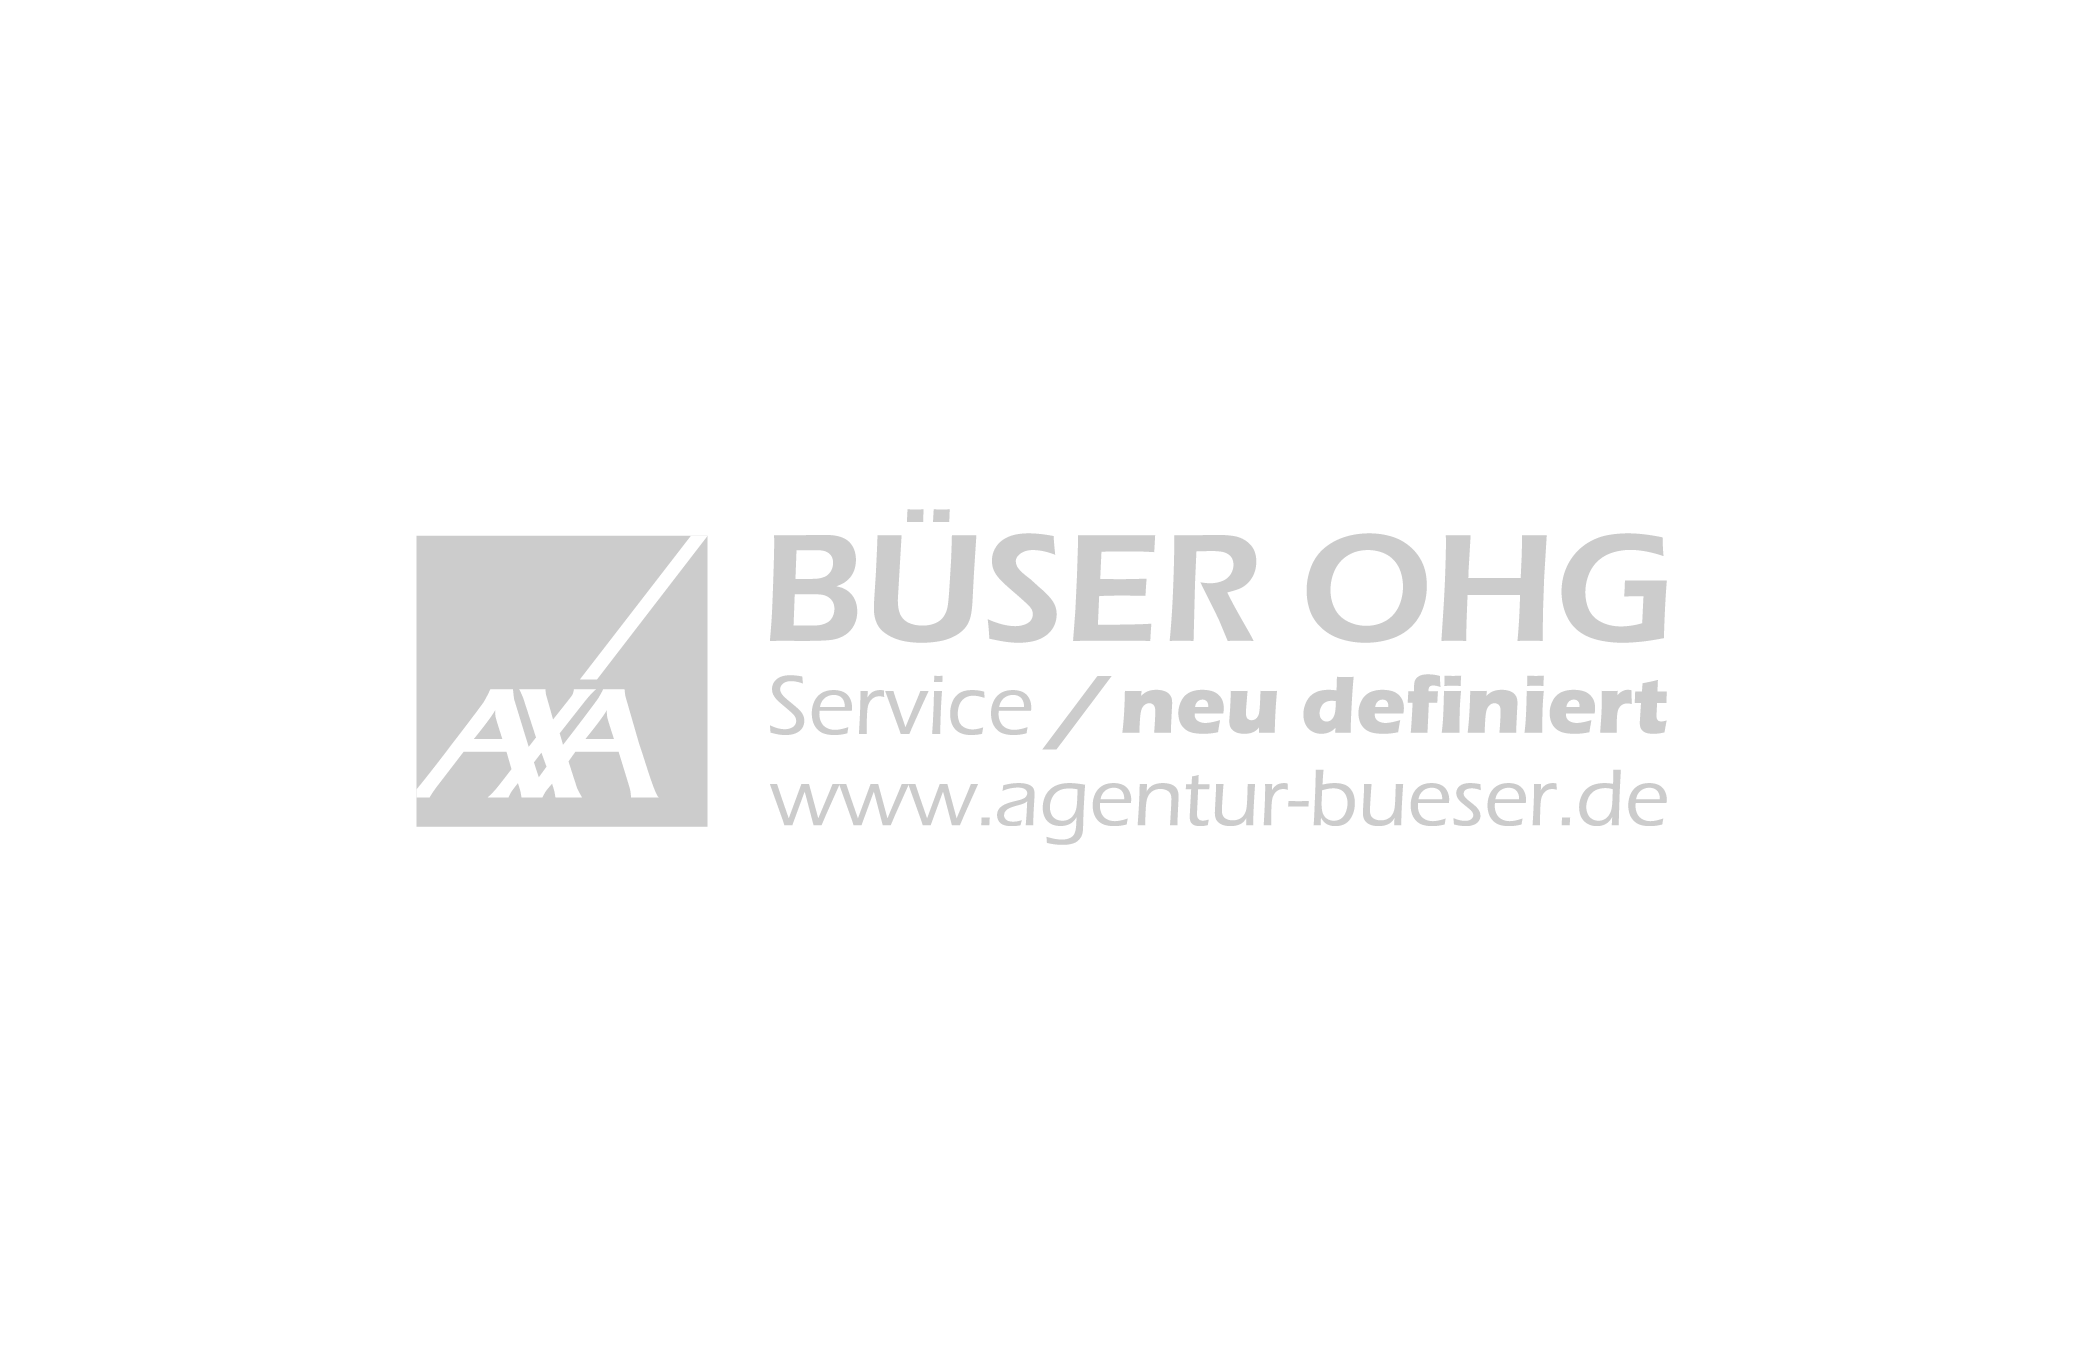 AXA Büser OHG